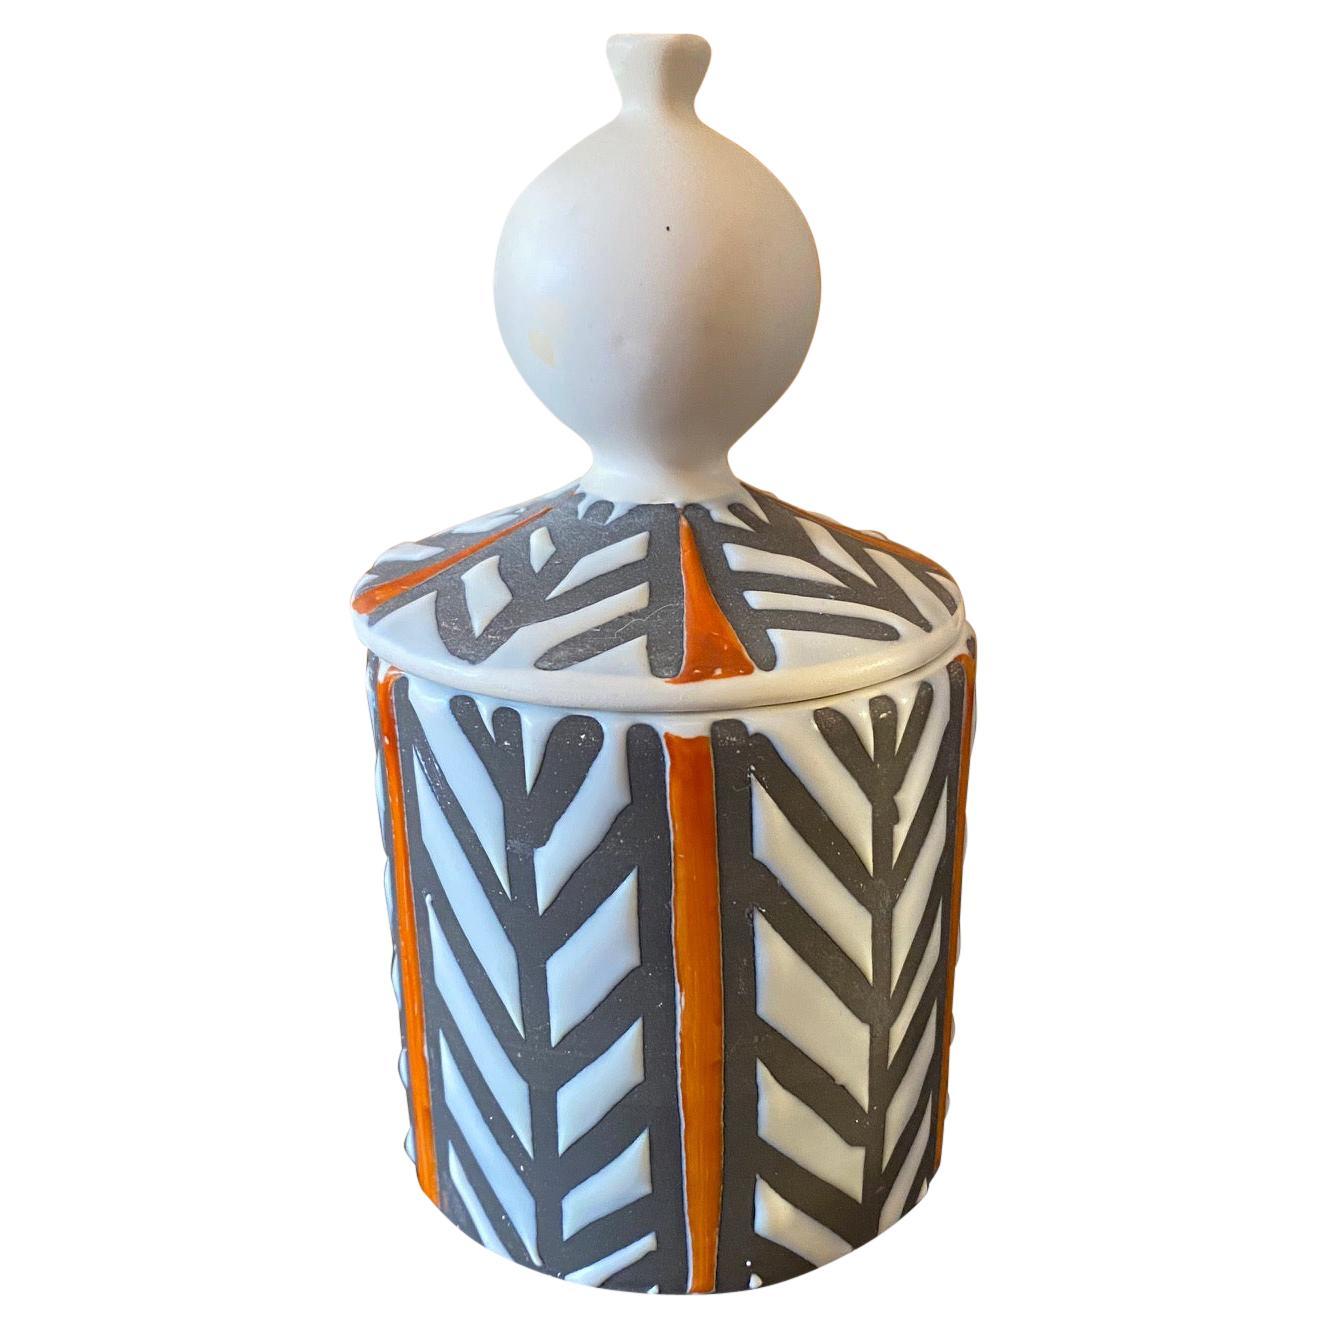 Ceramic Box by Roger Capron, France, 1960s